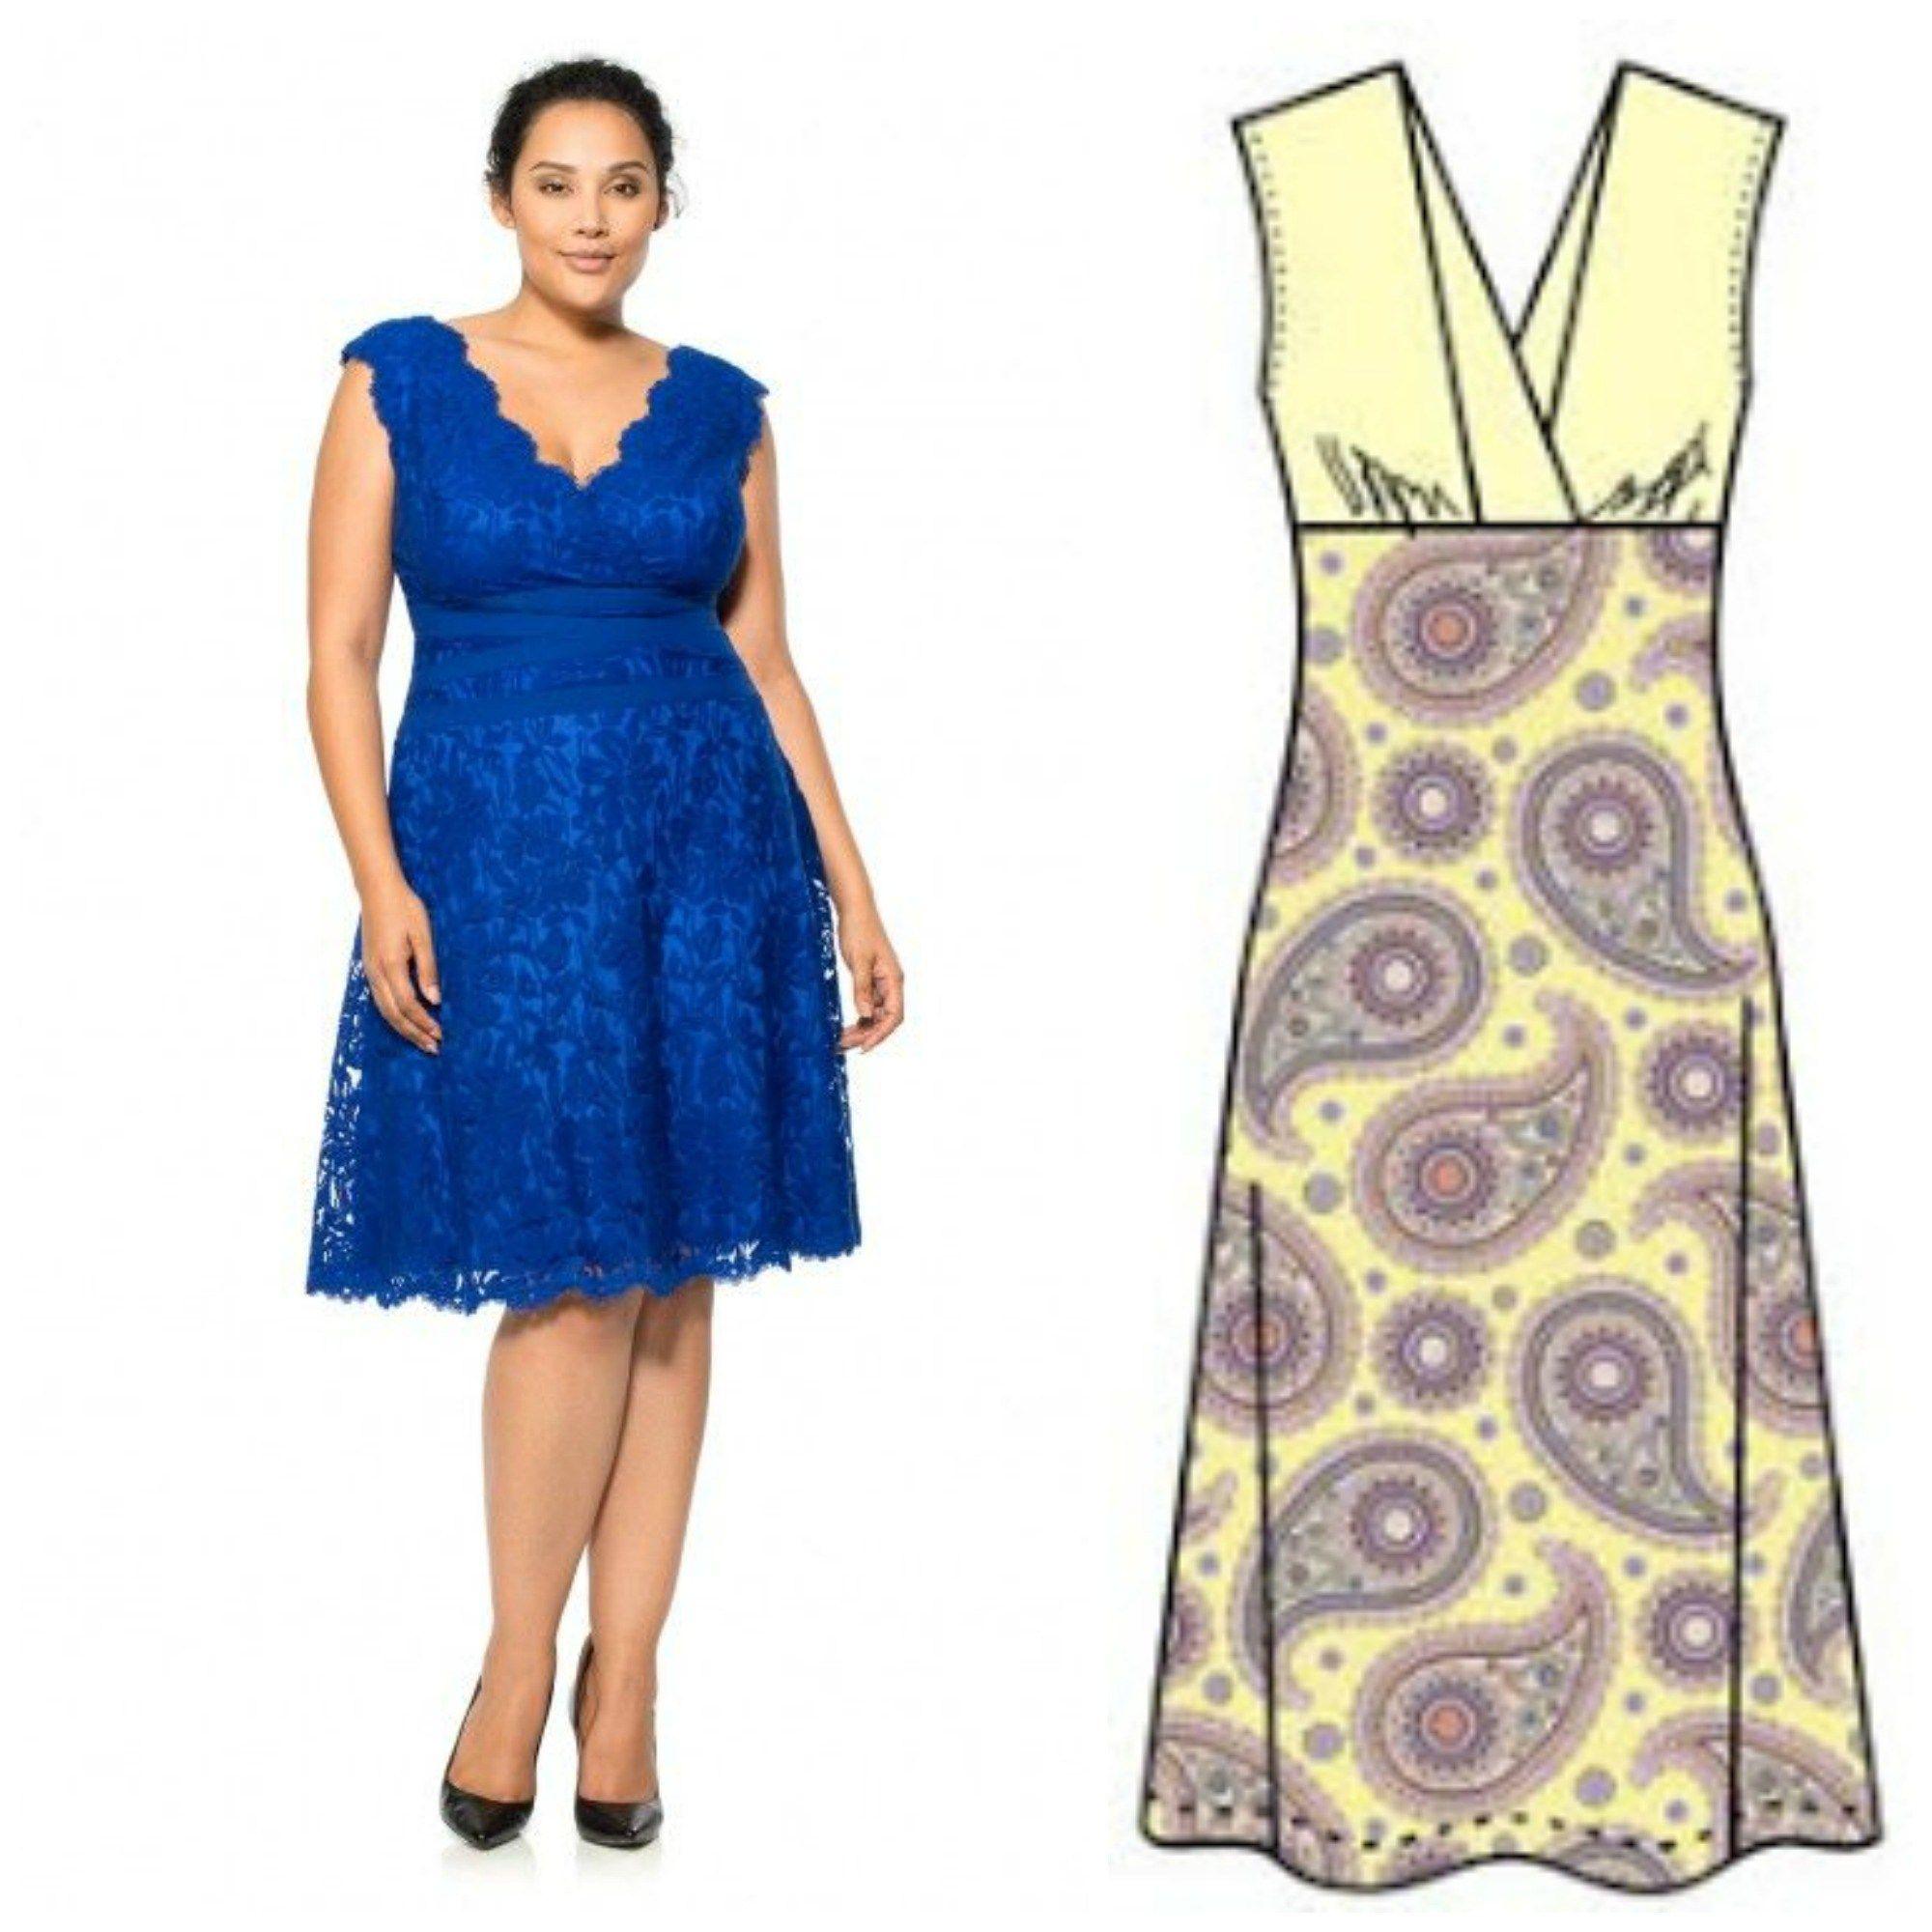 V Neck Dress Pattern Free | Sewing | Pinterest | Vero moda, Damas y ...